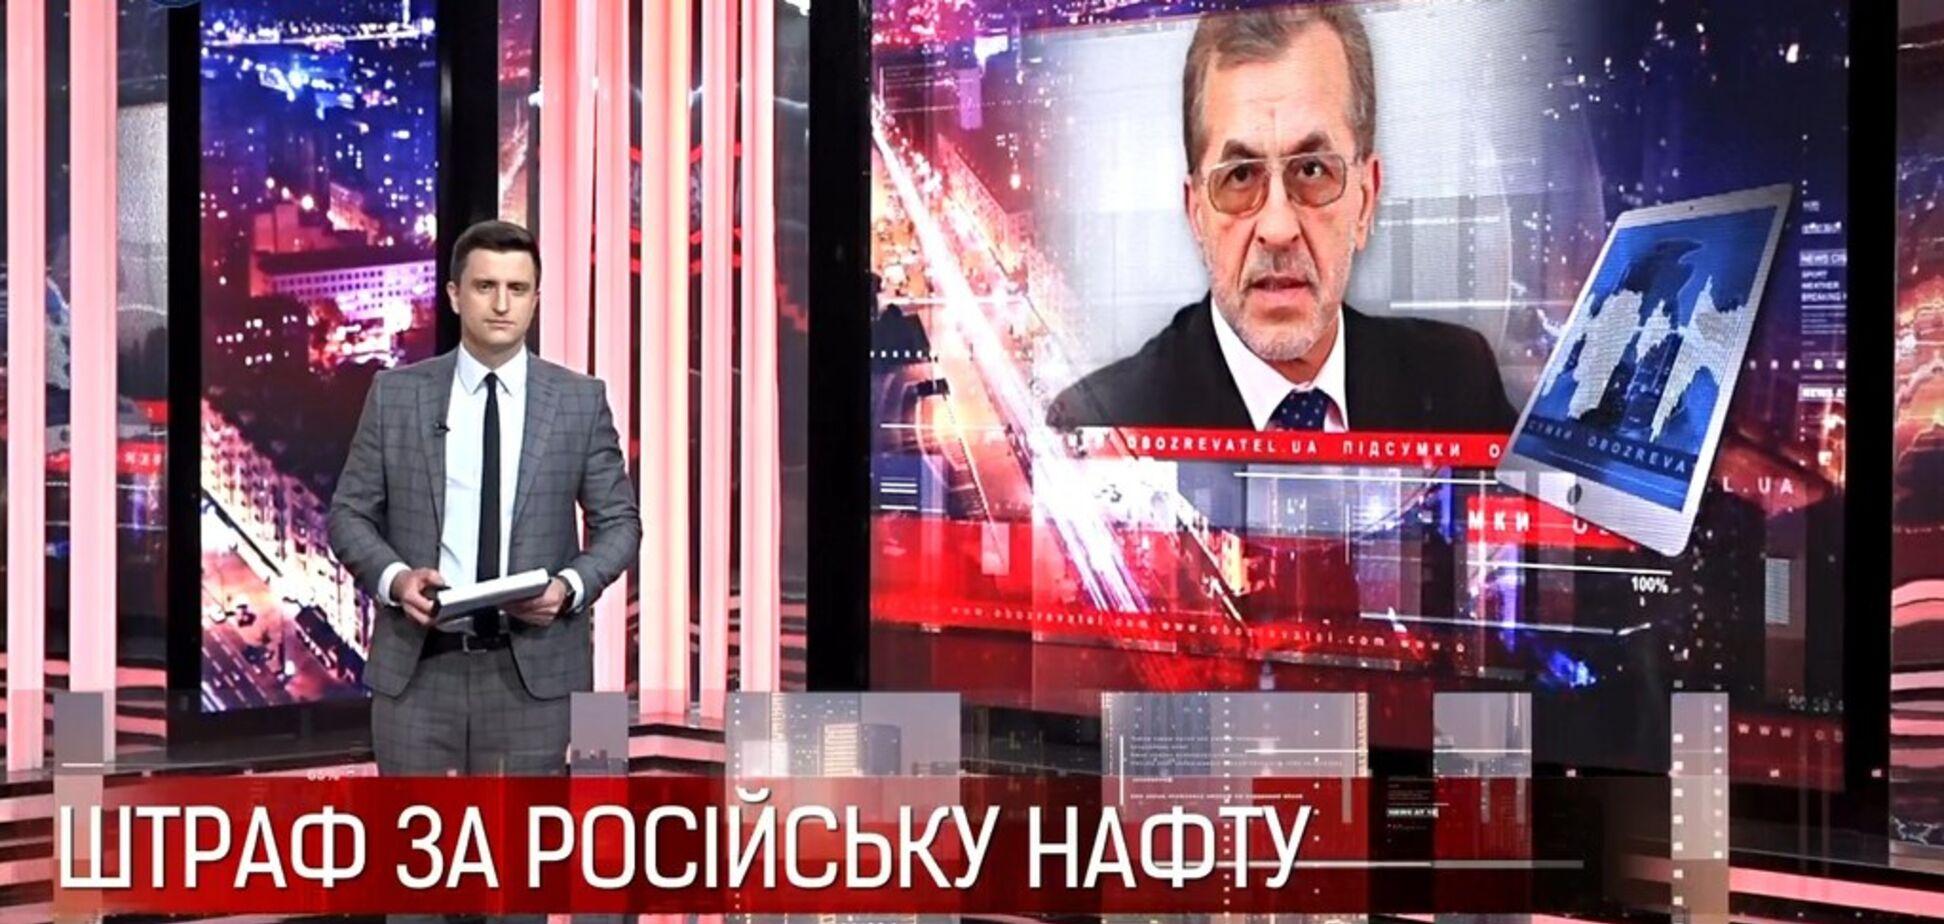 Косянчук: Украина заработала 2 млн евро на 'грязной нефти' Путина